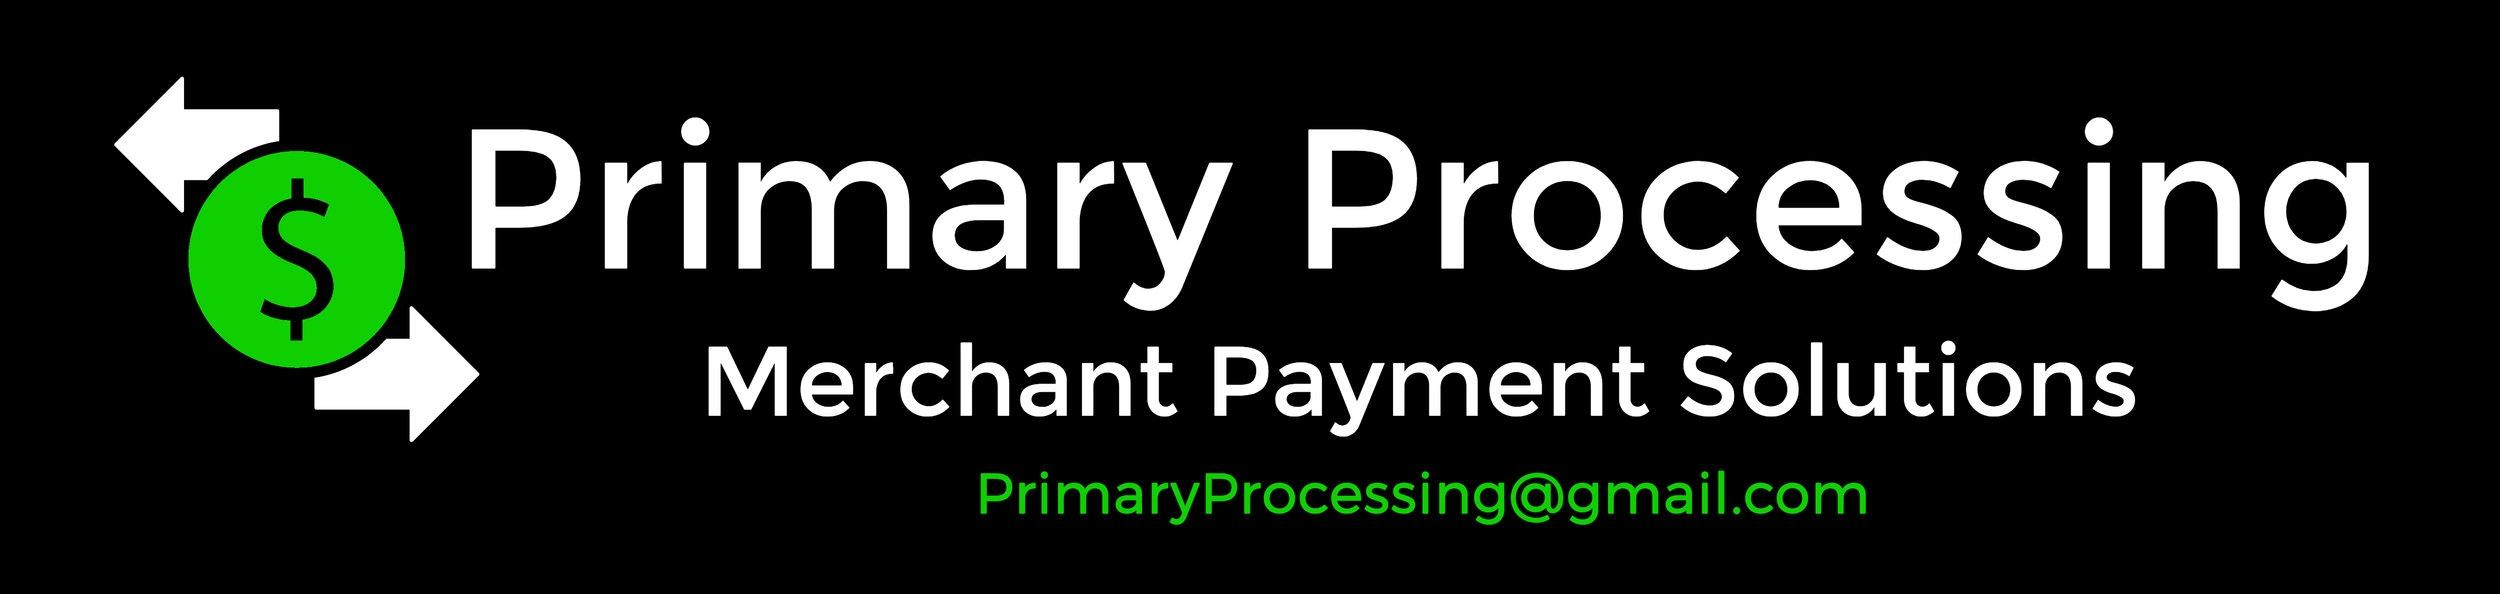 Primary Processing-logo.jpg